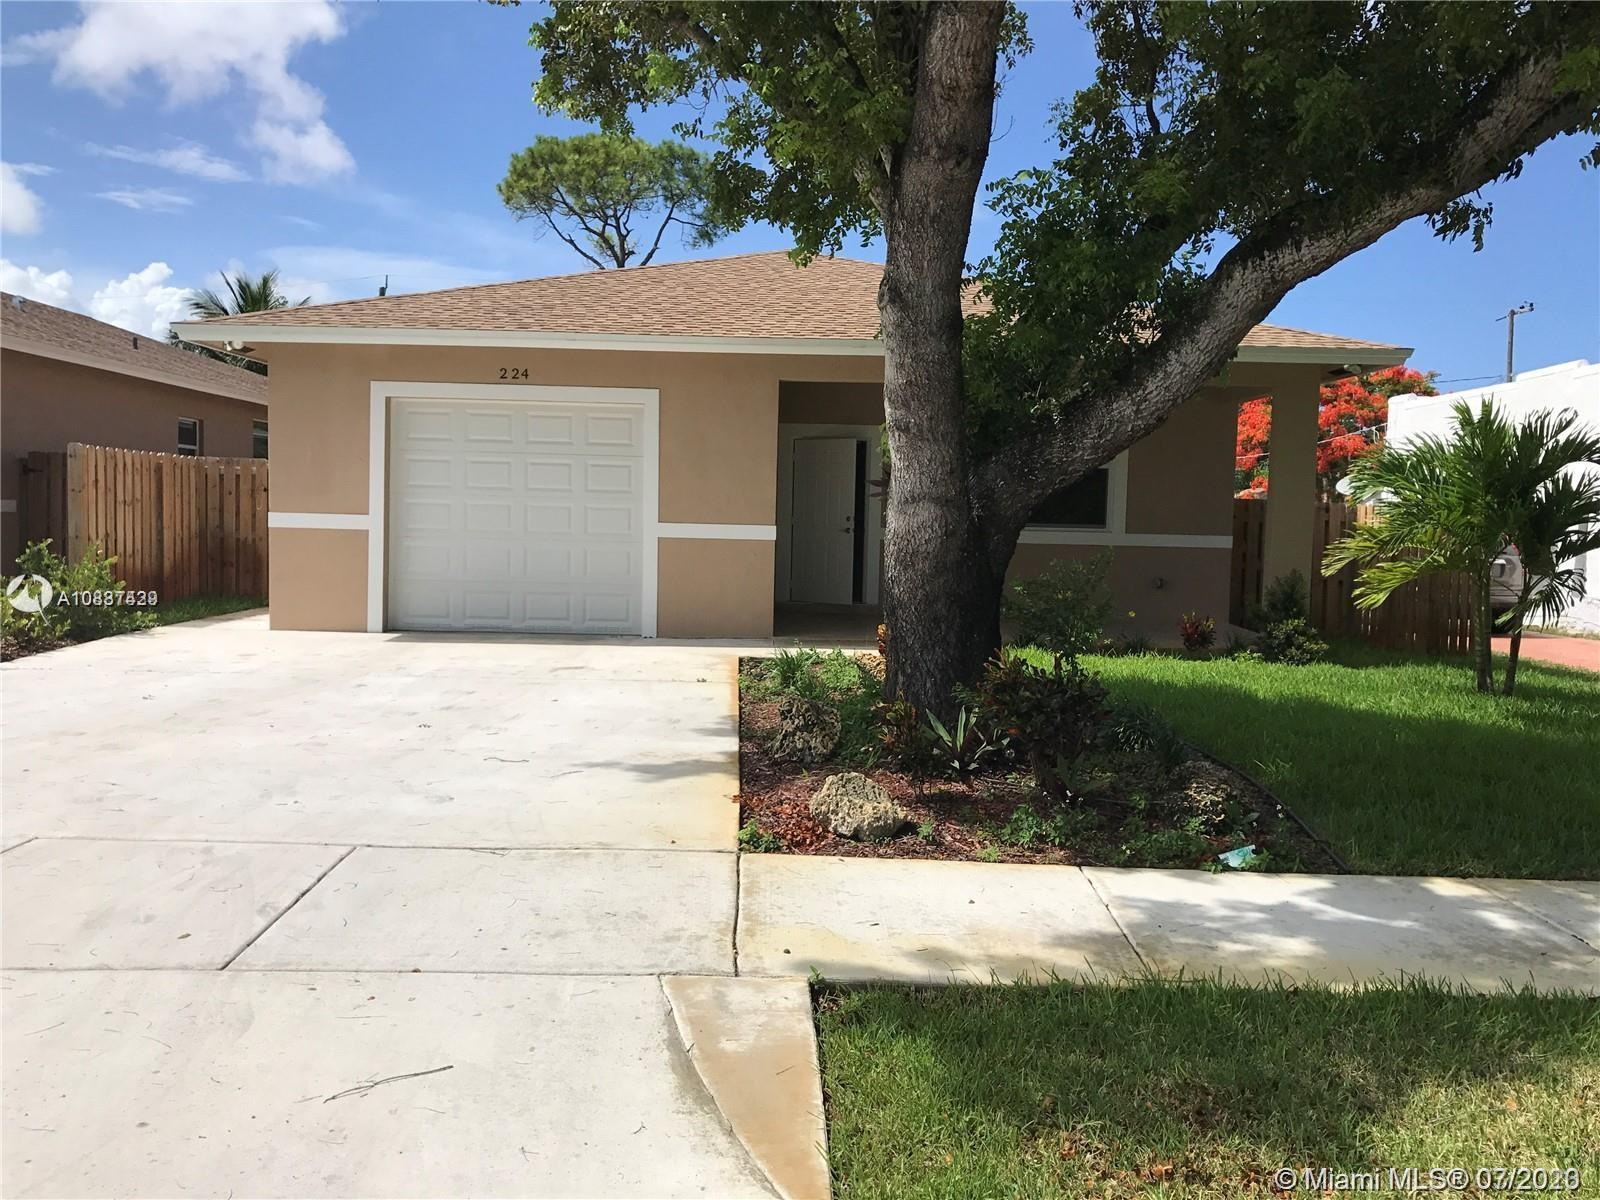 A10887429 Property Photo